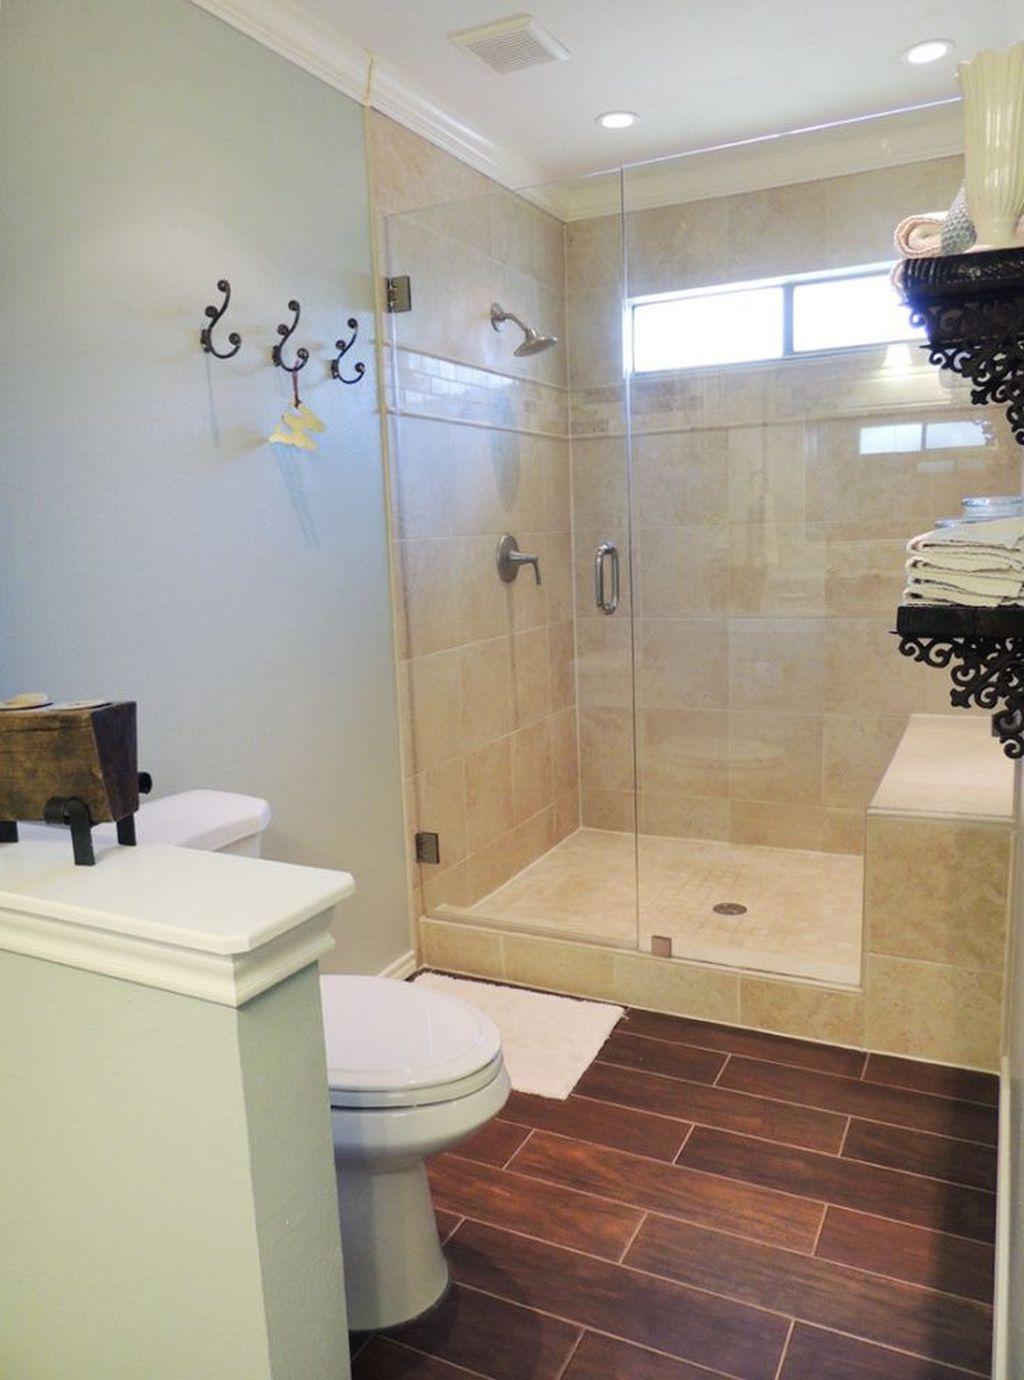 Marvelous Wooden Shower Floor Tiles Designs Ideas For Bathroom Remodel 16